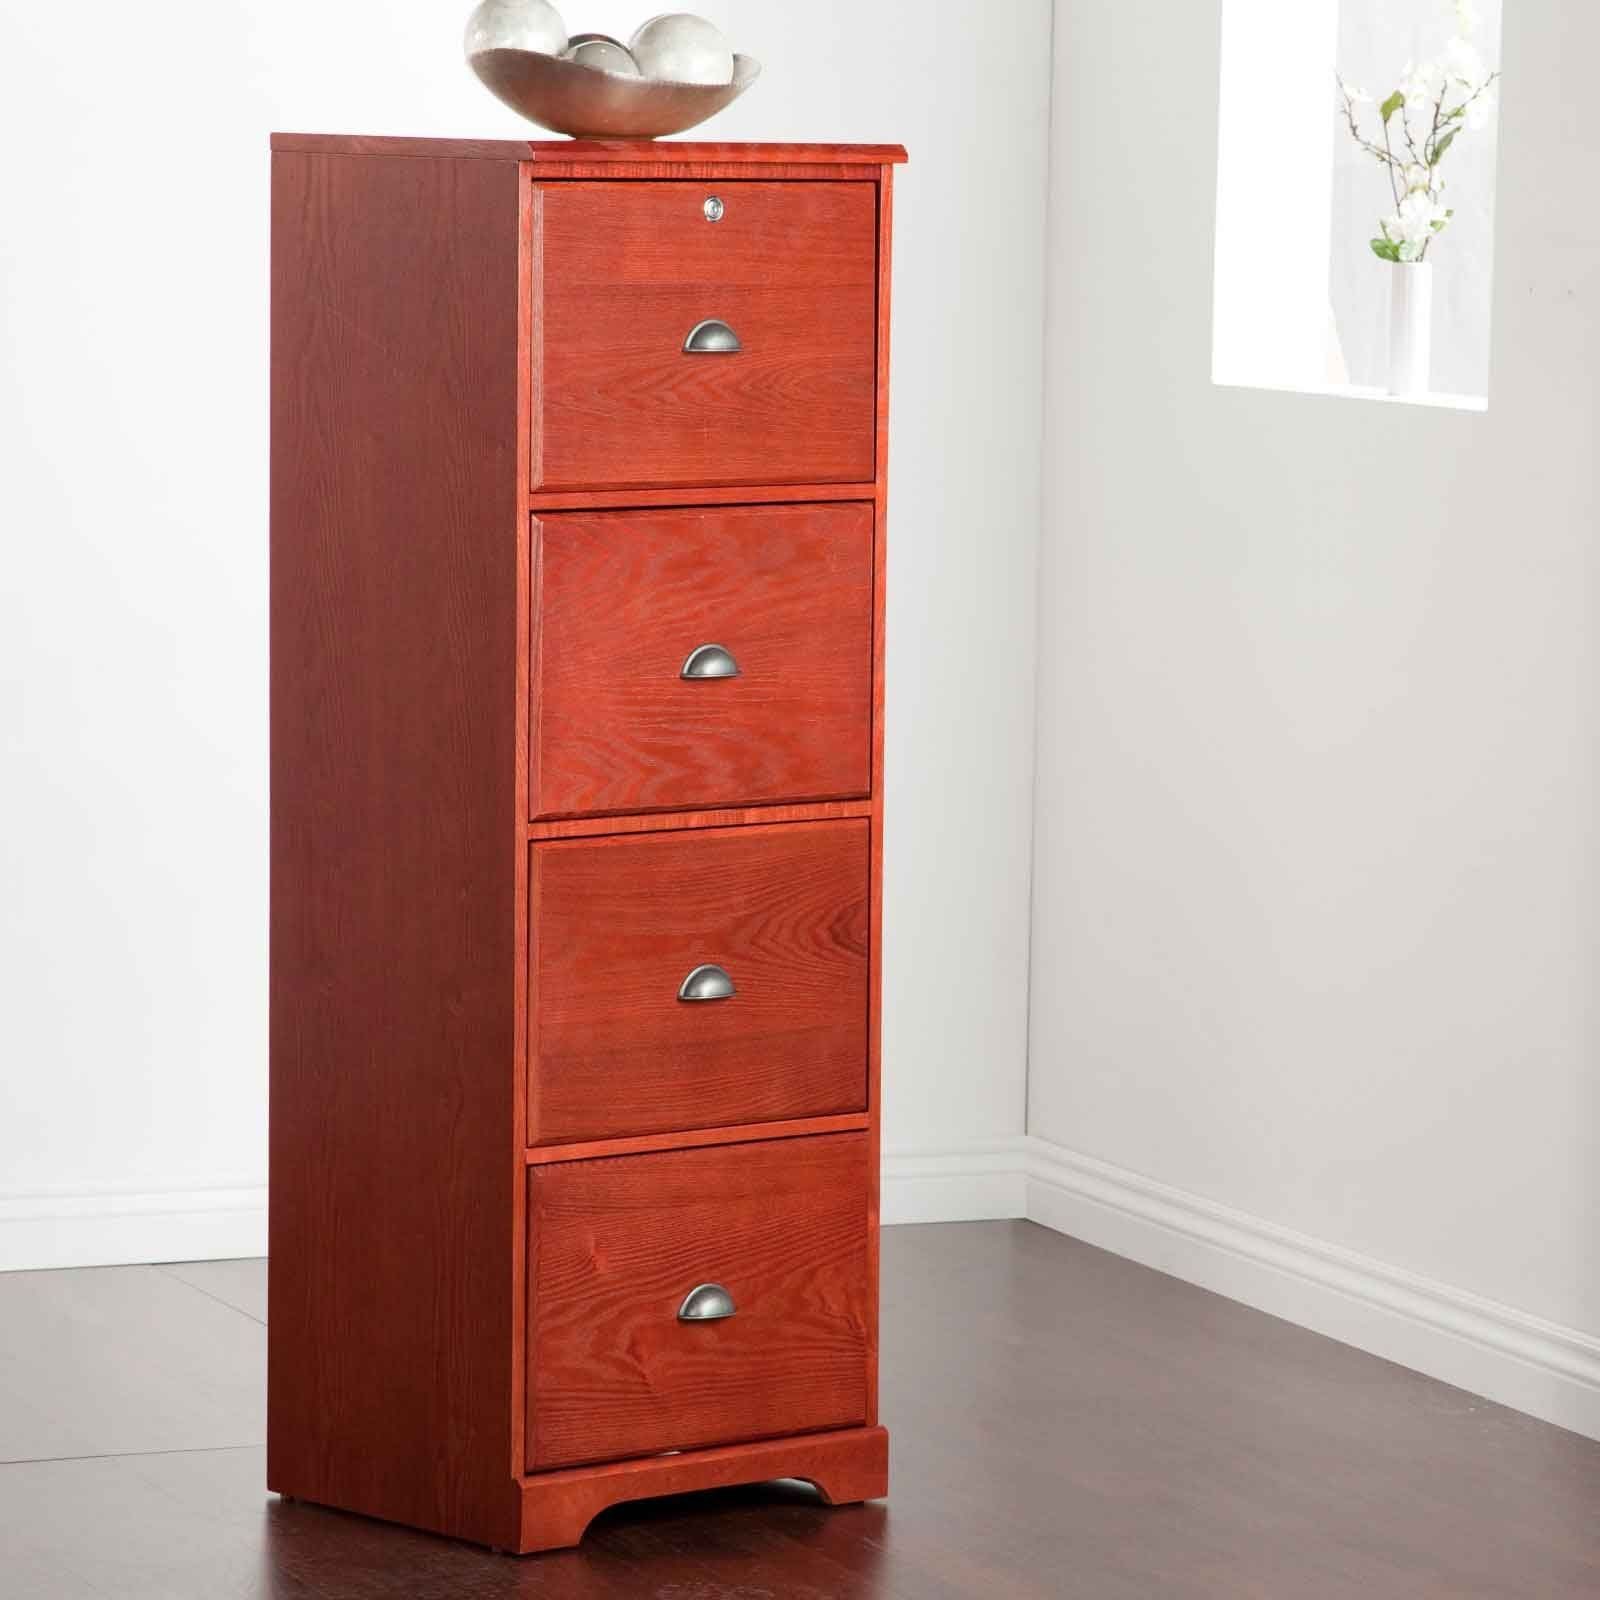 Vertical Wood File Cabinets 4 Drawer httpadvicetipscom